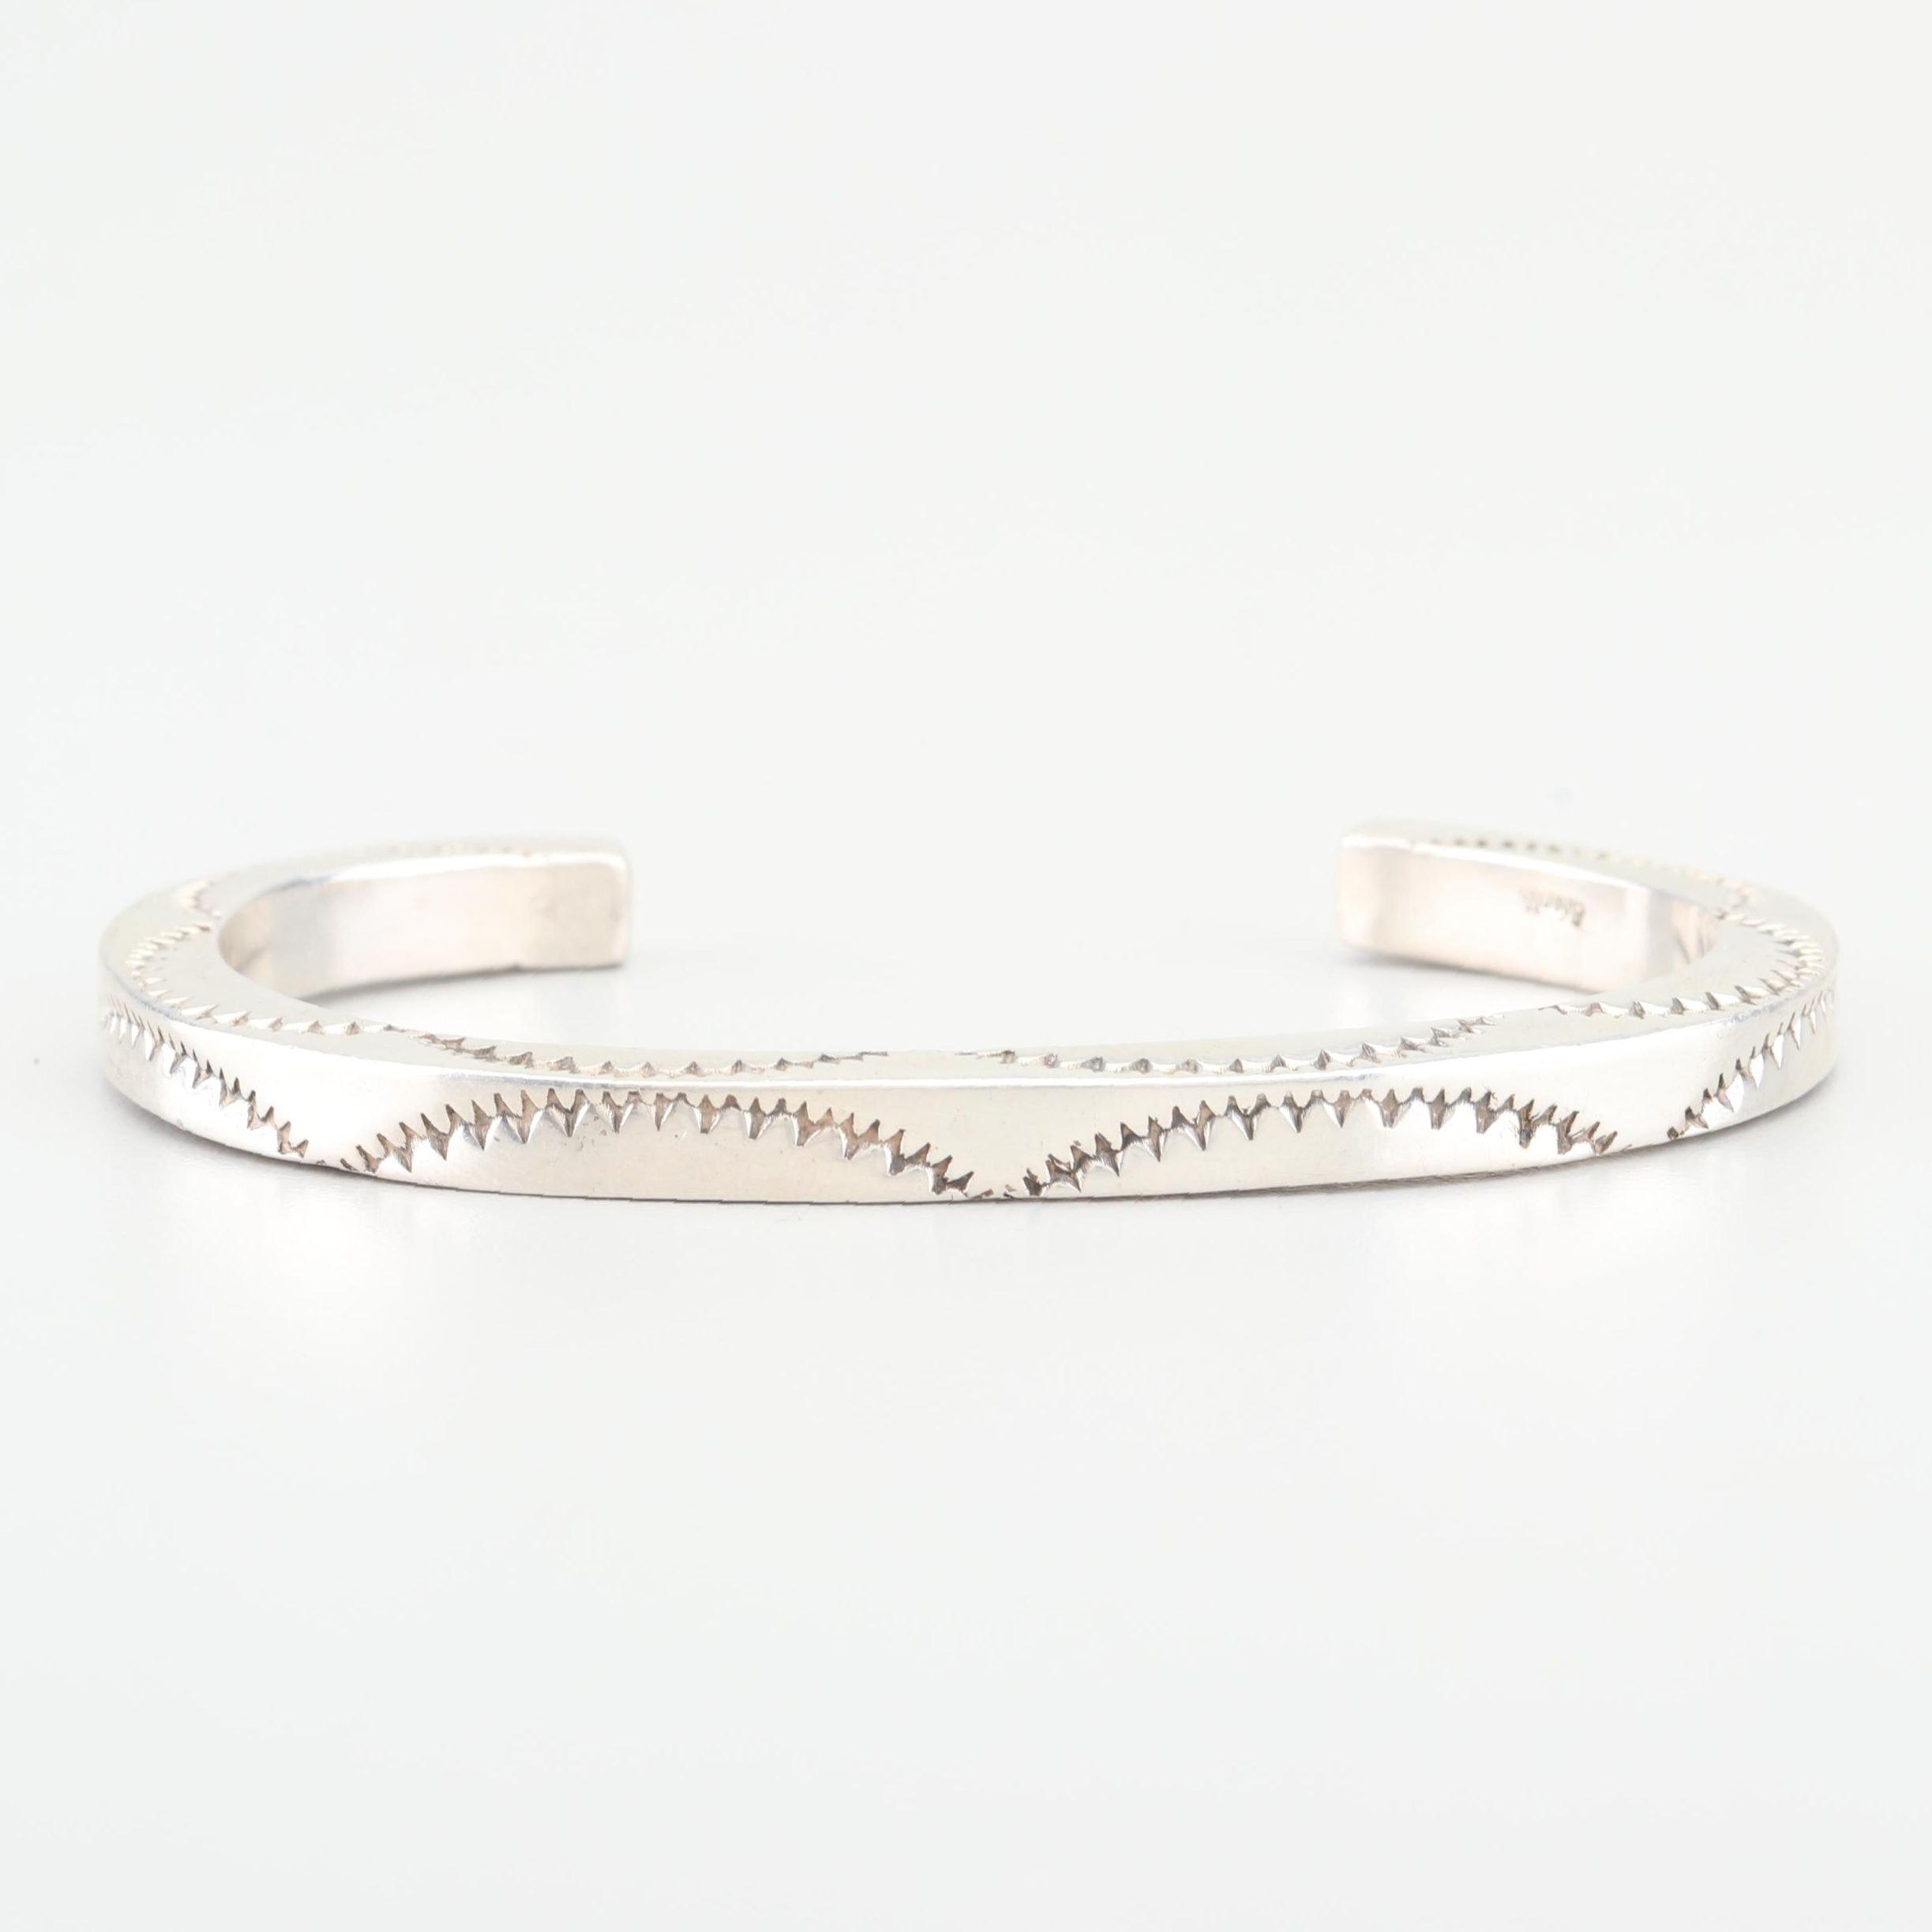 Sterling Silver Concho Style Cuff Bracelet